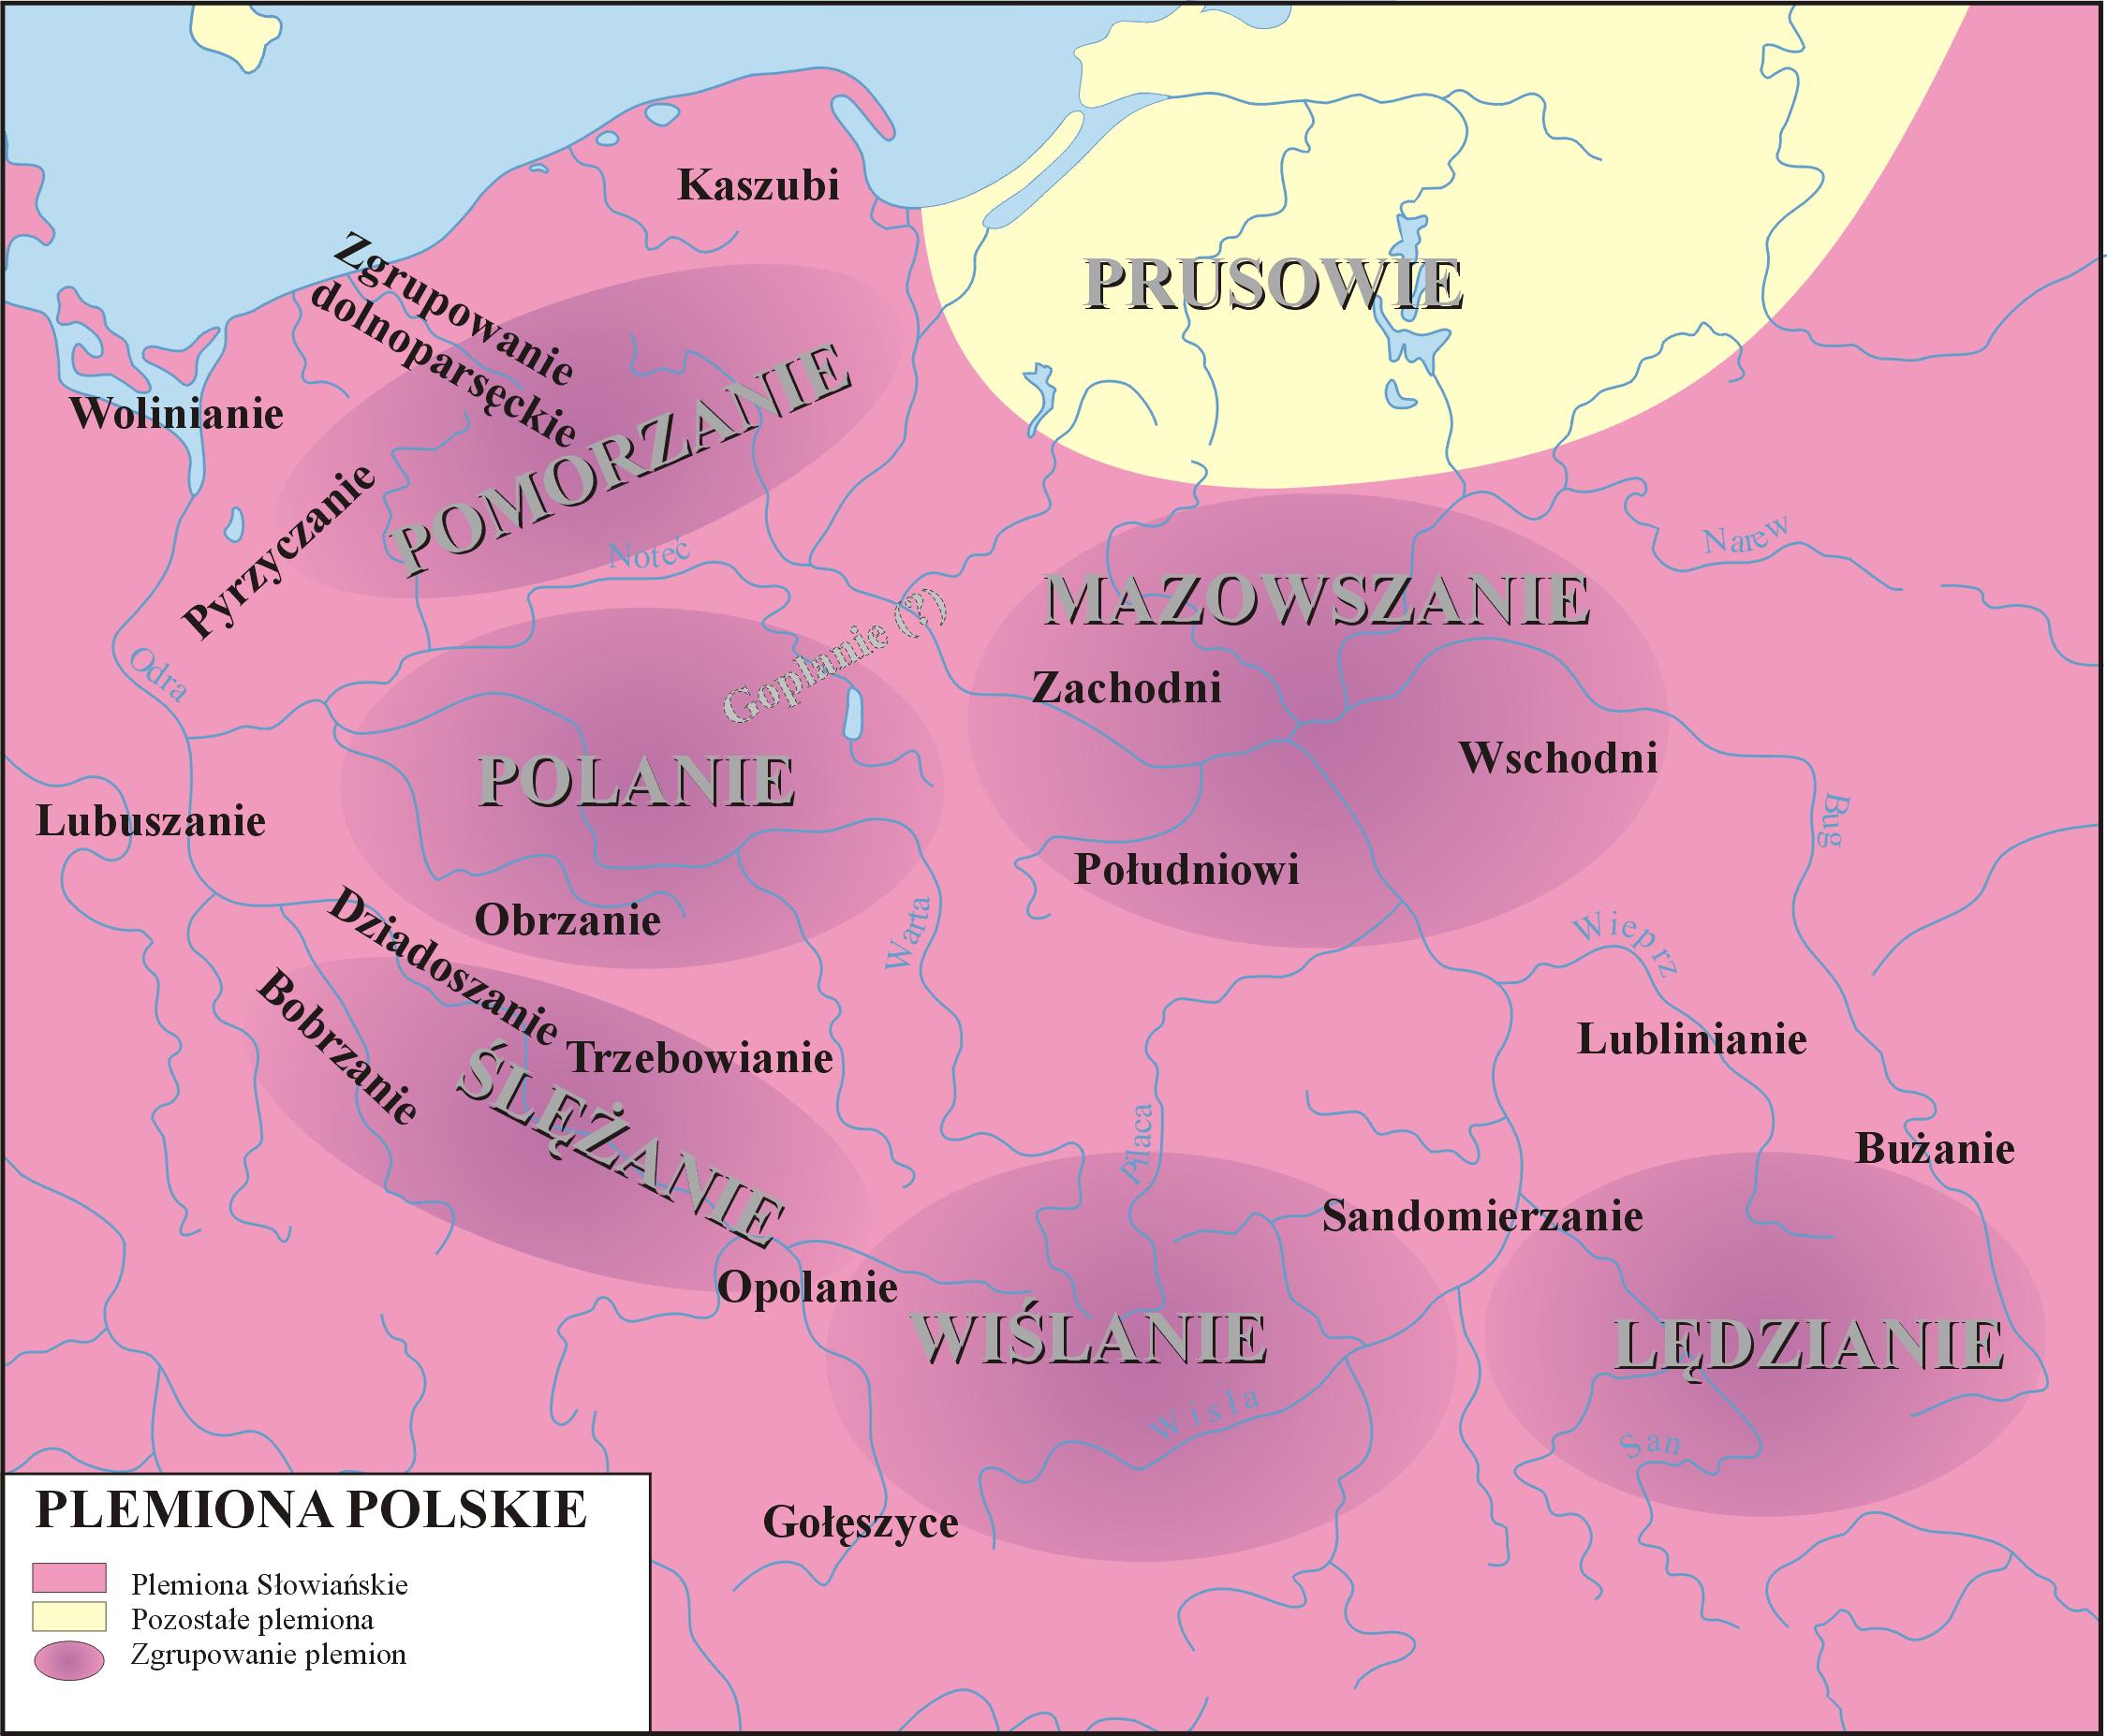 https://upload.wikimedia.org/wikipedia/commons/2/2b/Plemiona_polskie.png